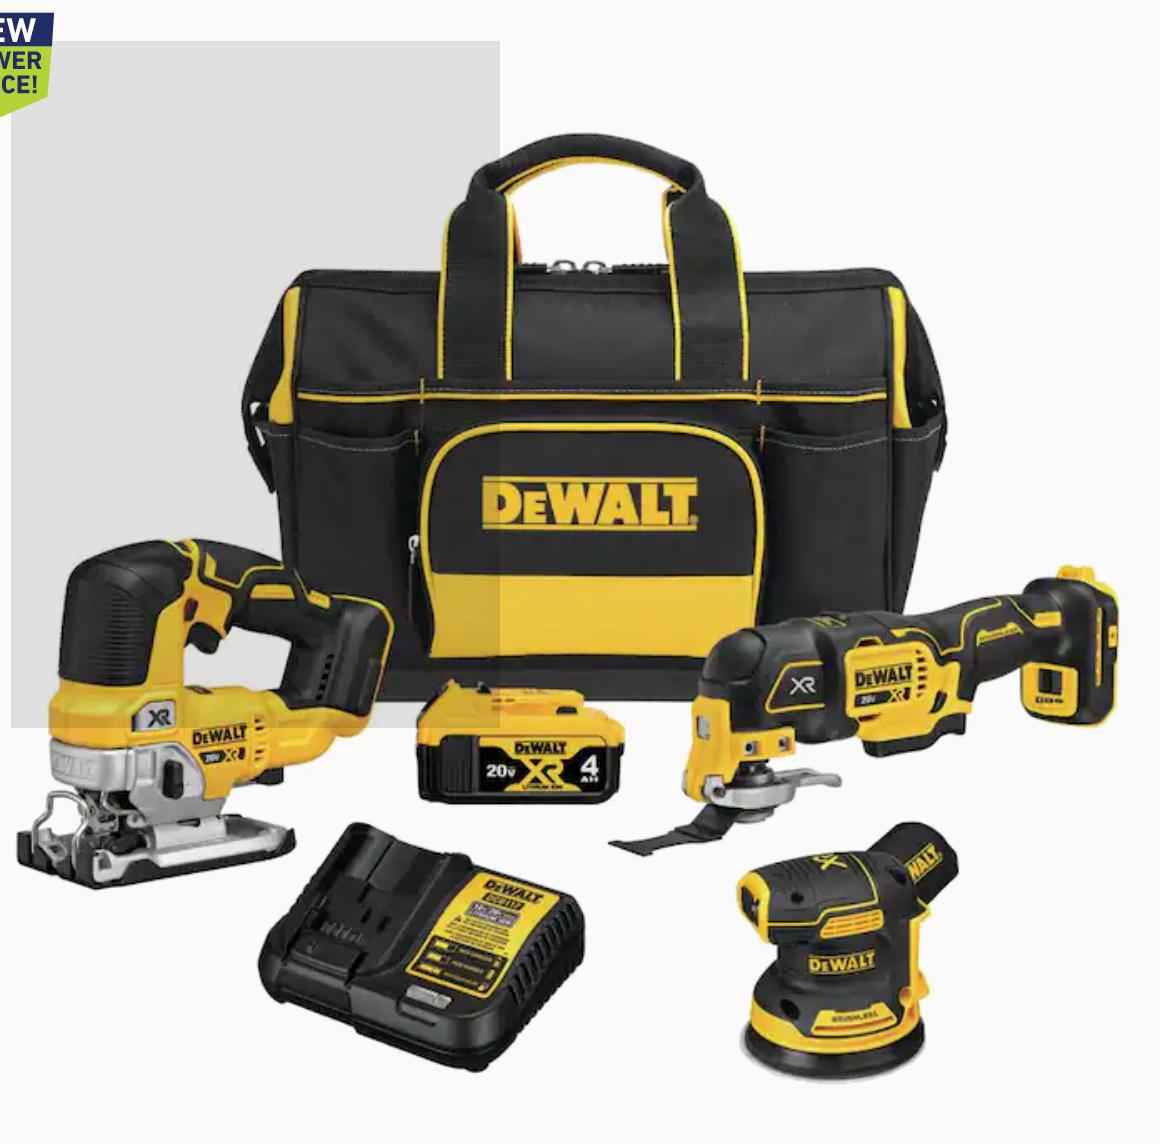 20v DeWalt - 3 Tool Kit